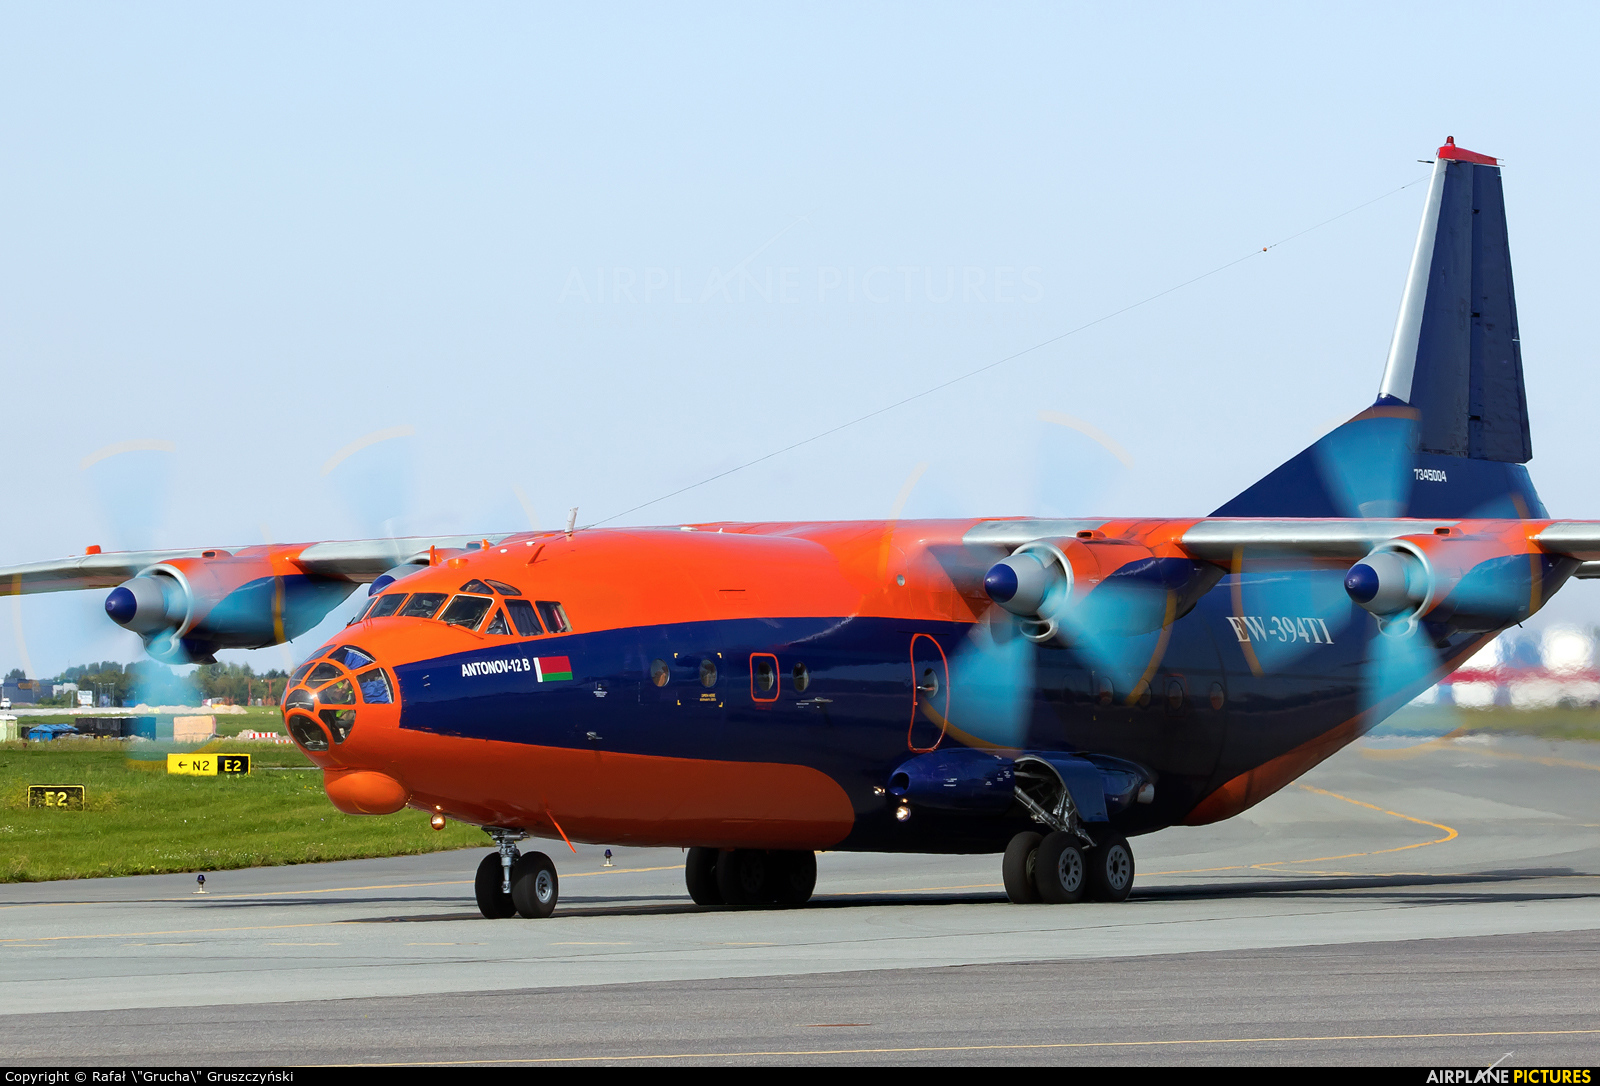 Ruby Star Air Enterprise EW-394TI aircraft at Warsaw - Frederic Chopin